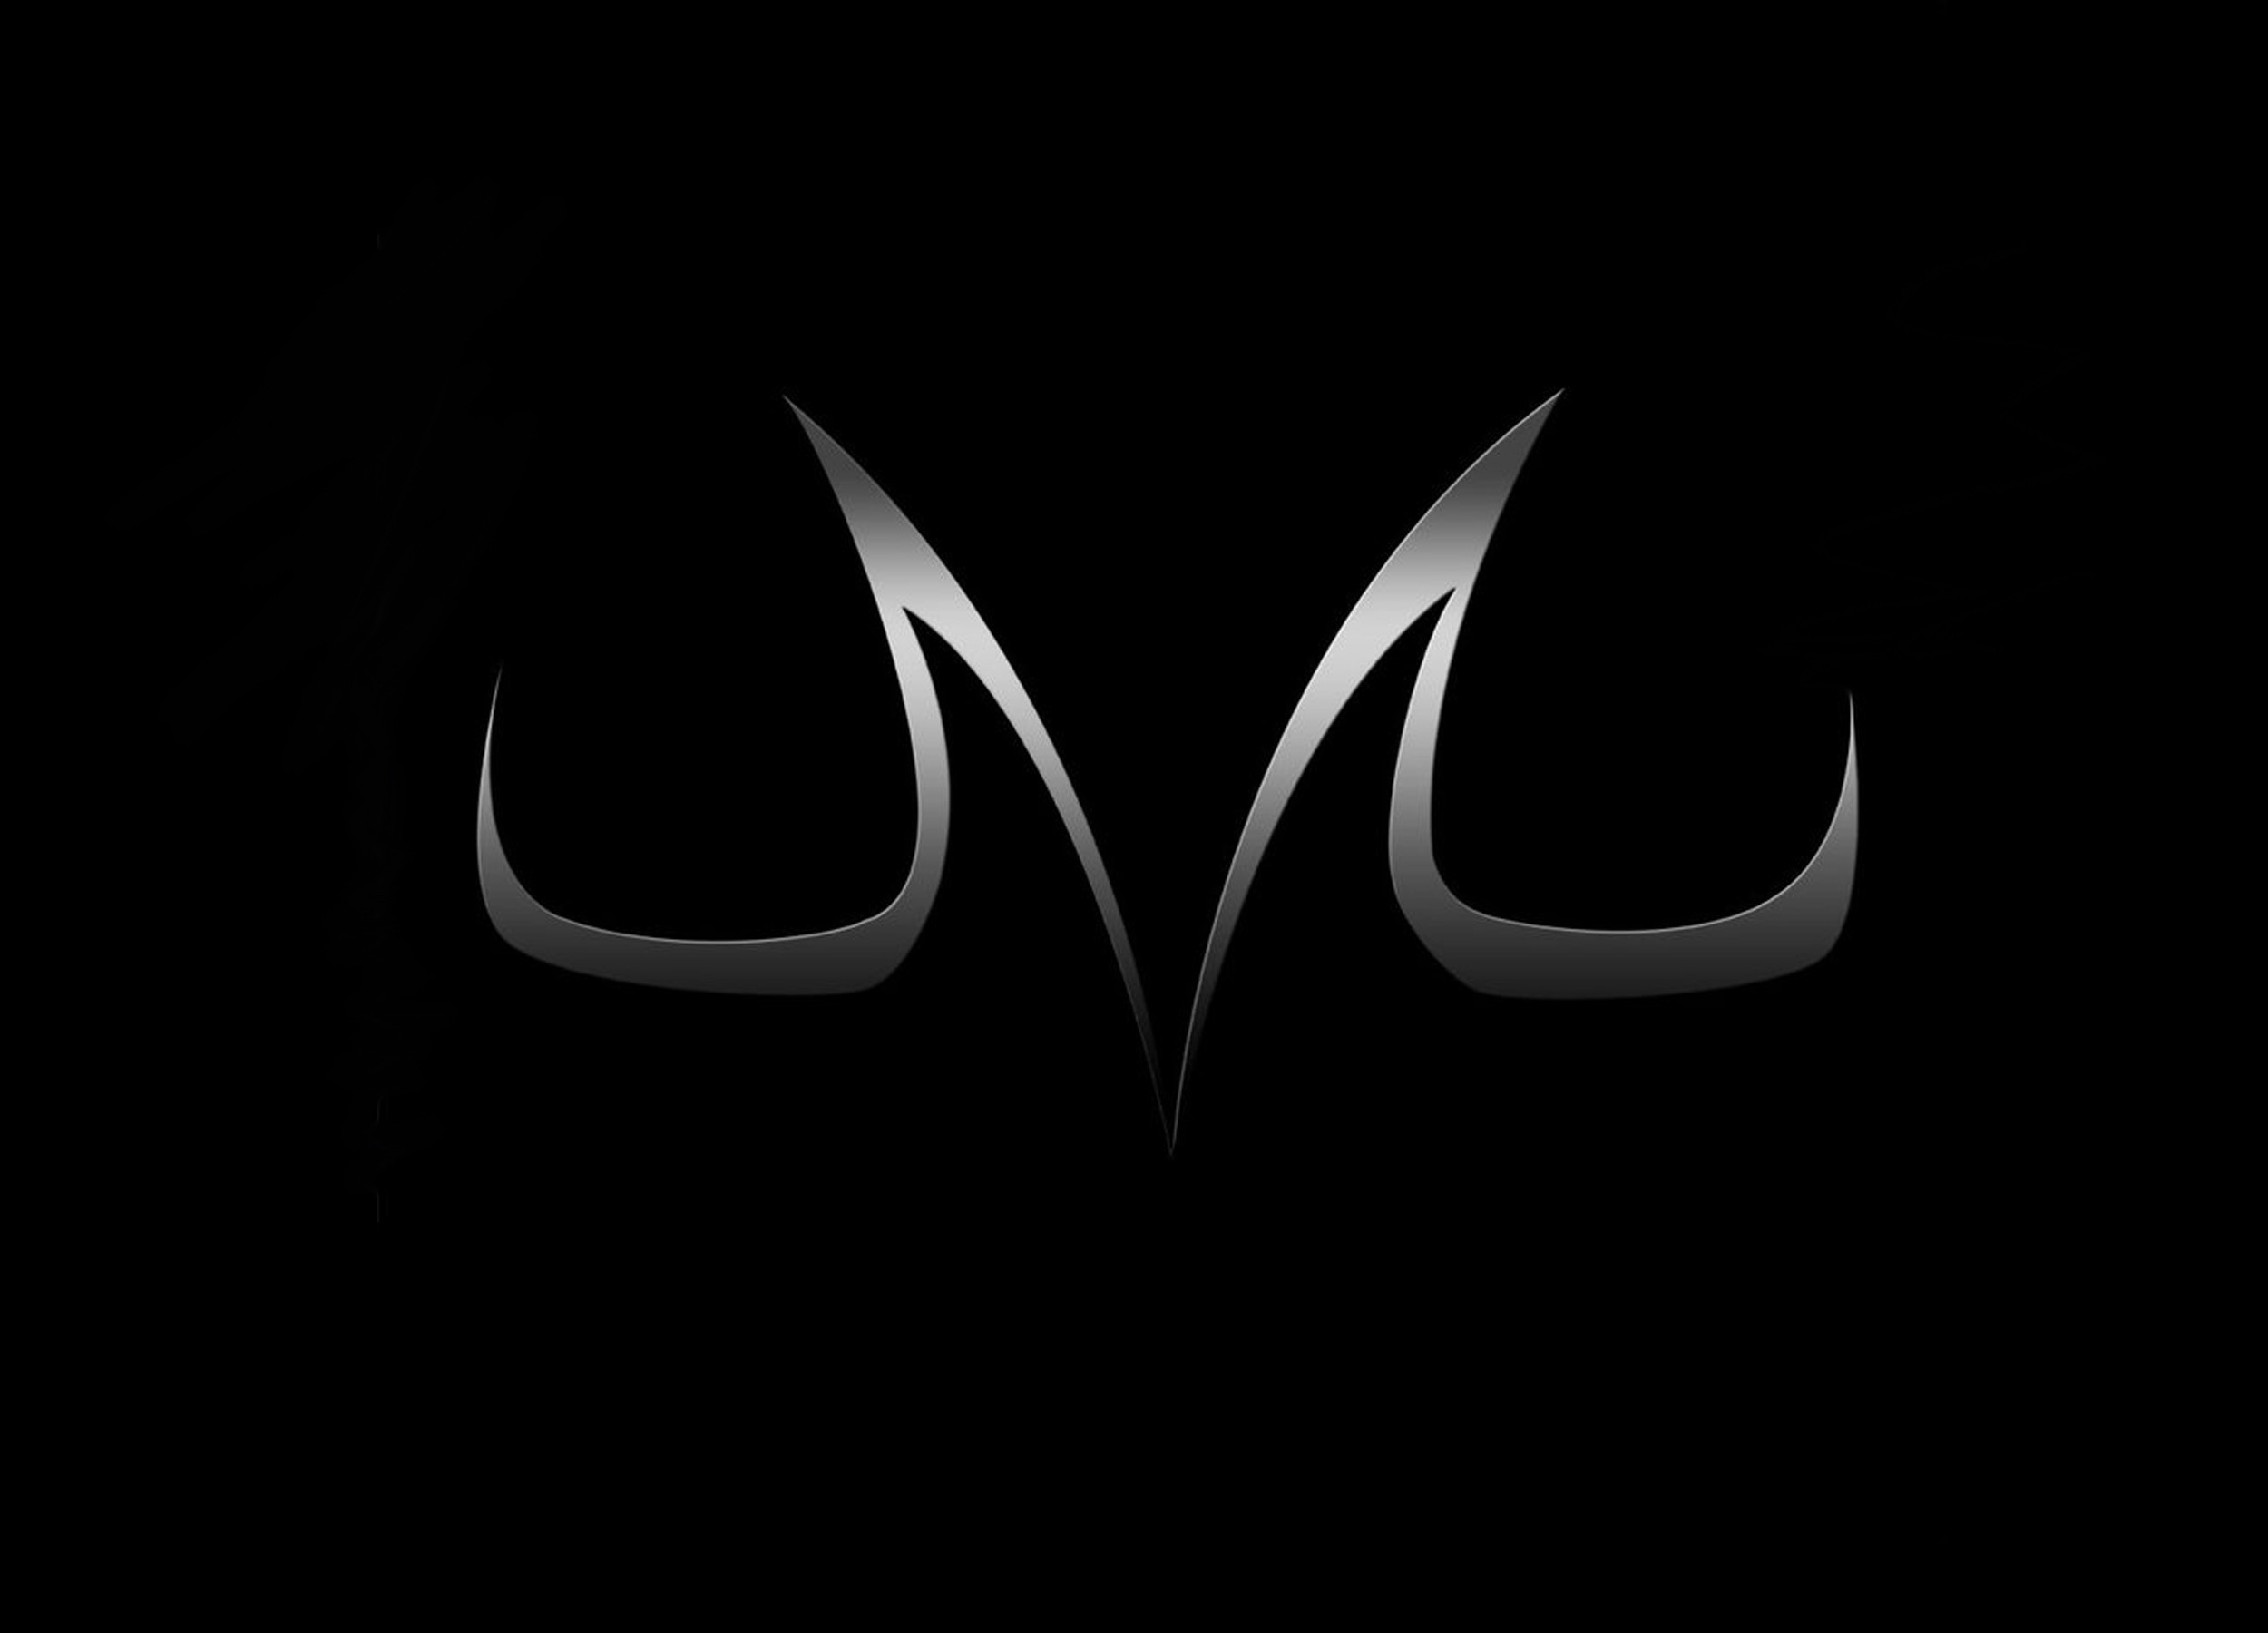 xp_black, Majin buu Logo Wallpaper – ForWallpaper.com